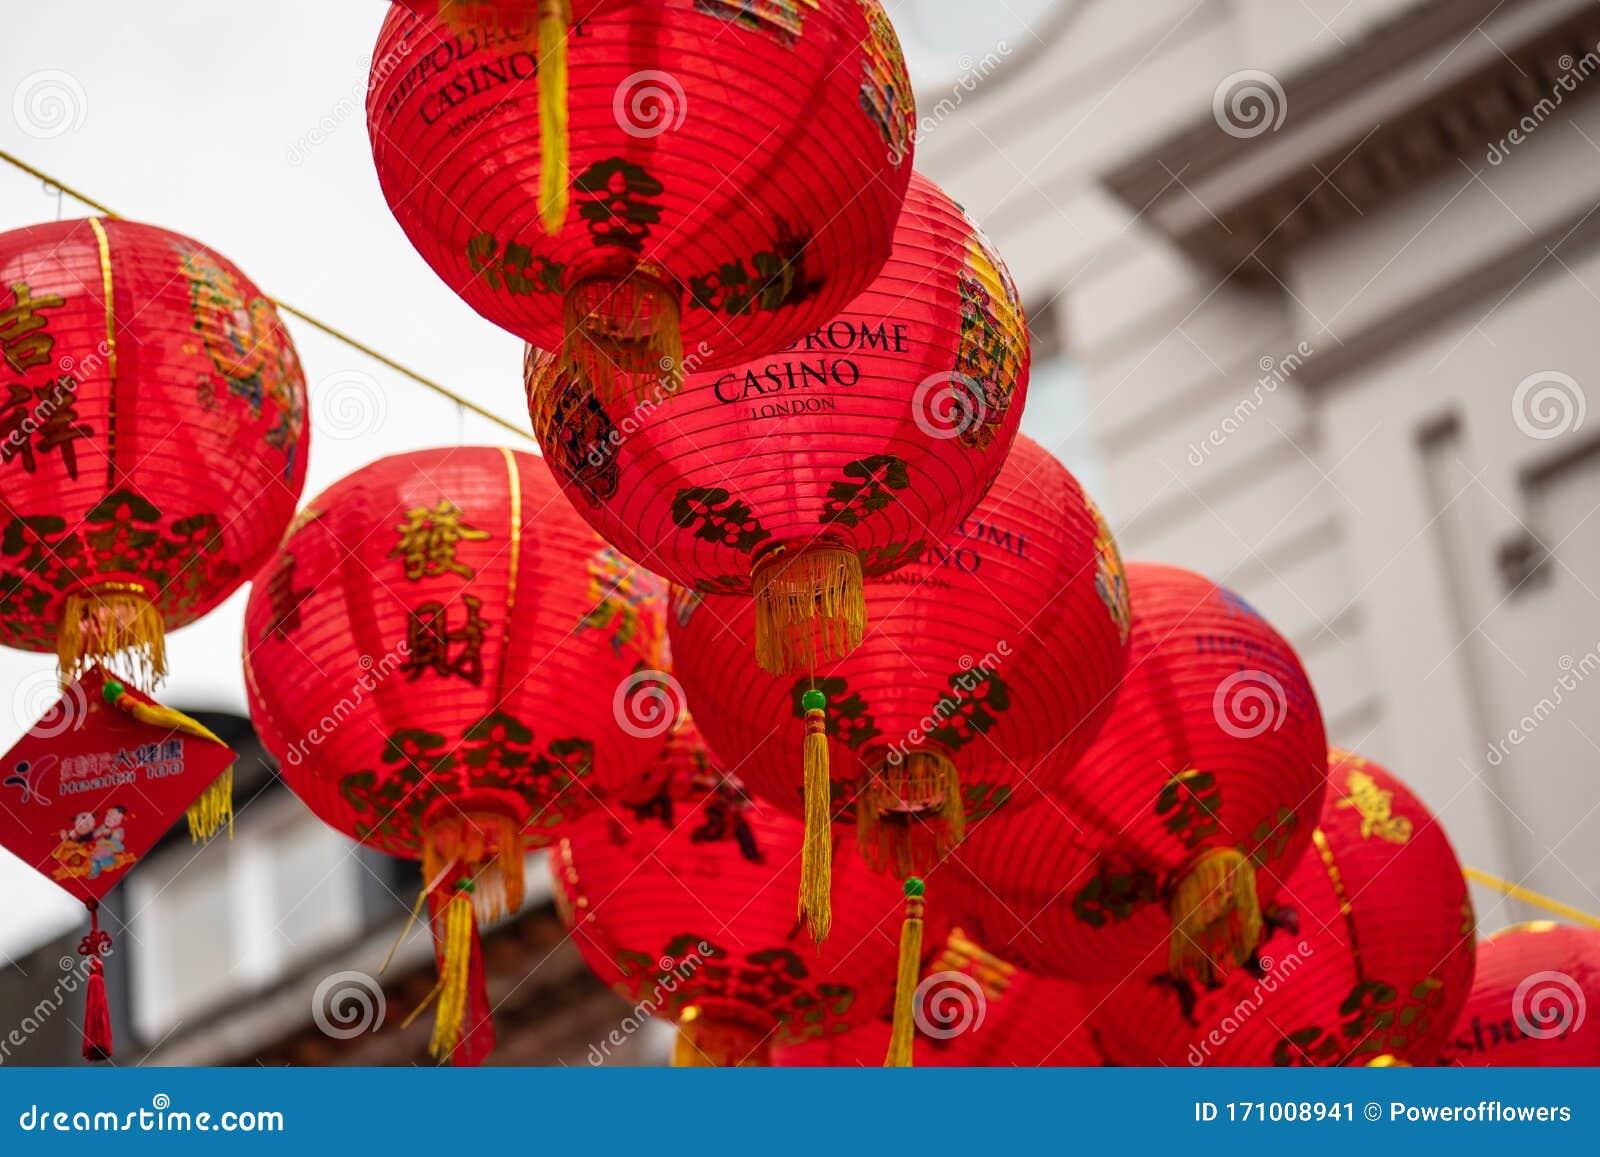 London January 26 2020 Chinese Paper Lanterns London Chinatown Chinese New Year Celebrations Editorial Photo Image Of Lantern Festival 171008941